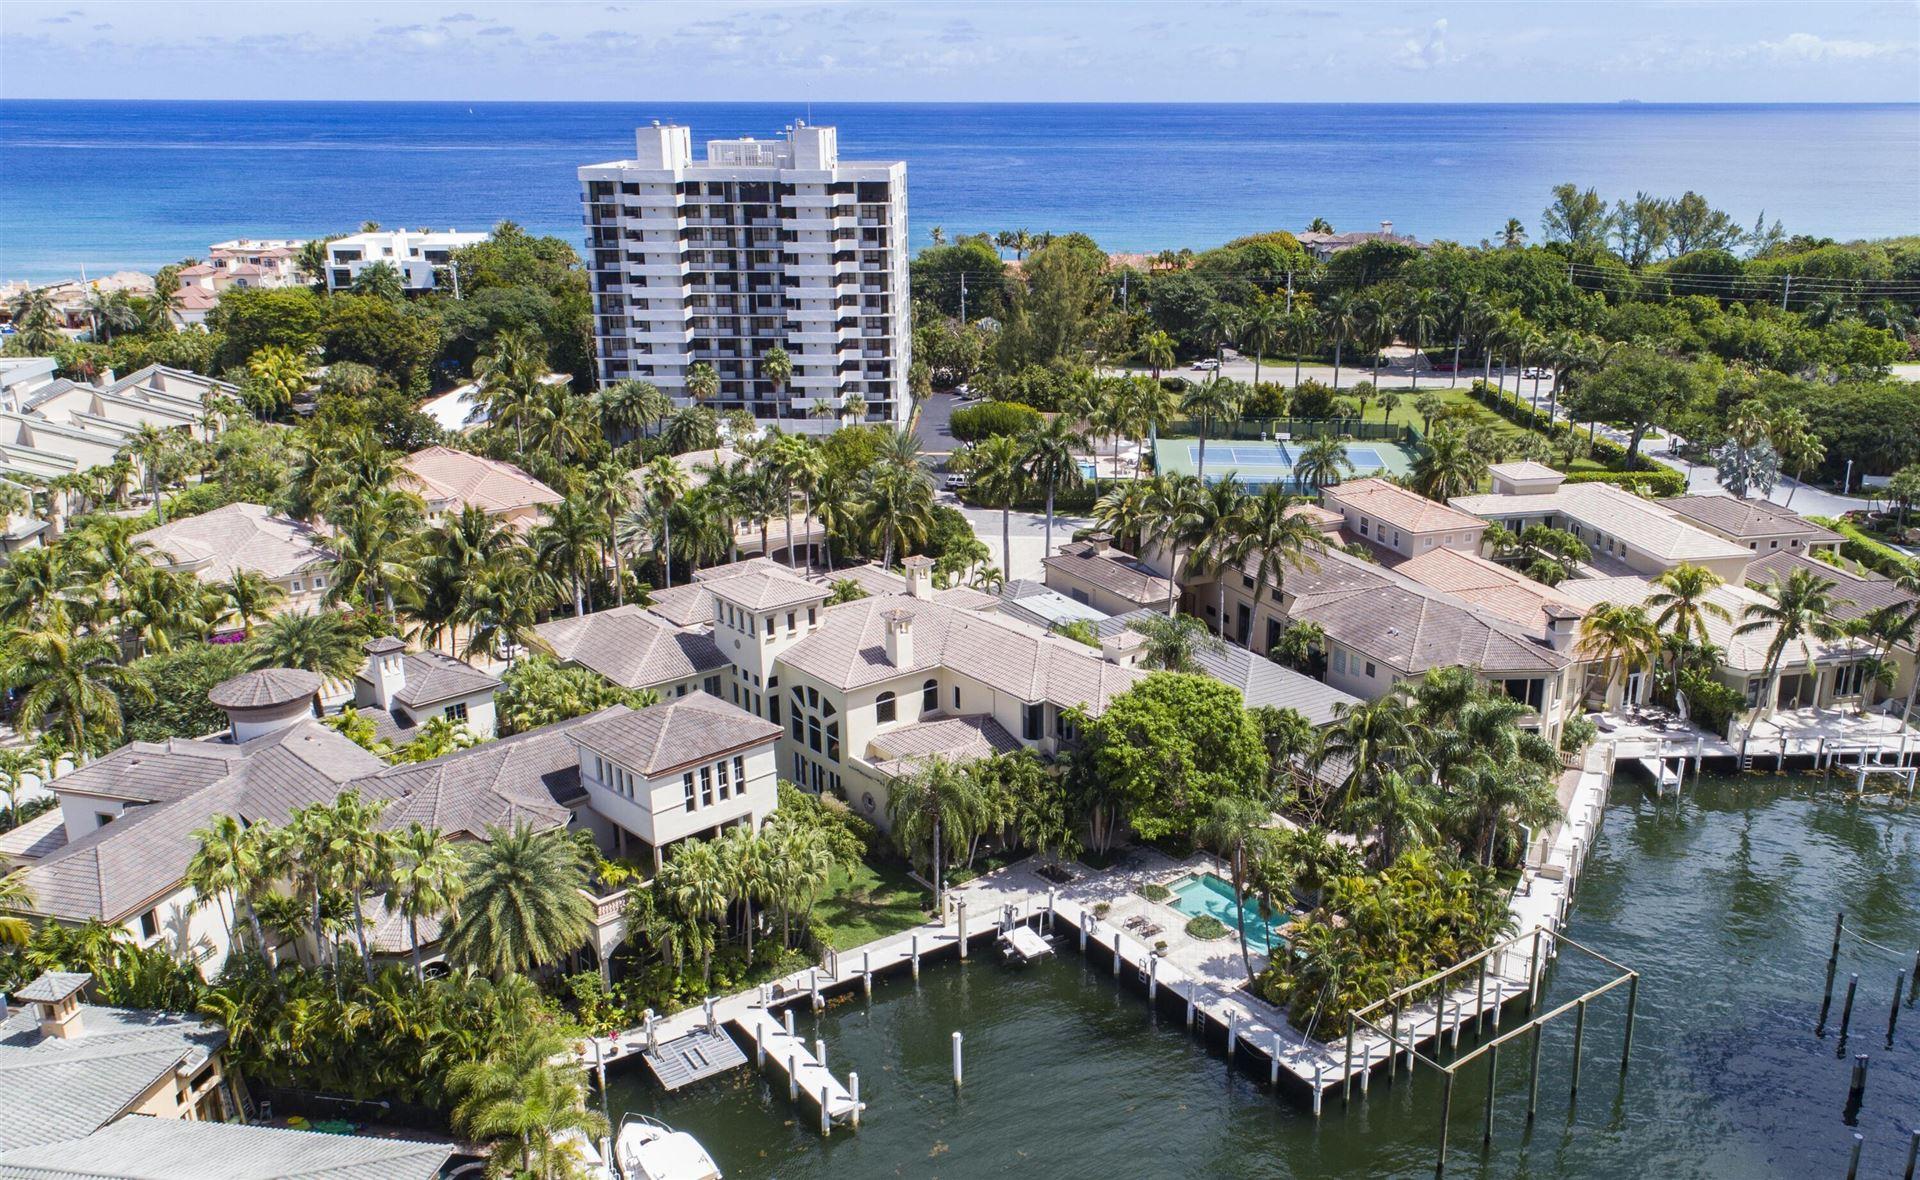 Photo of 1006 Grand Court, Highland Beach, FL 33487 (MLS # RX-10724326)